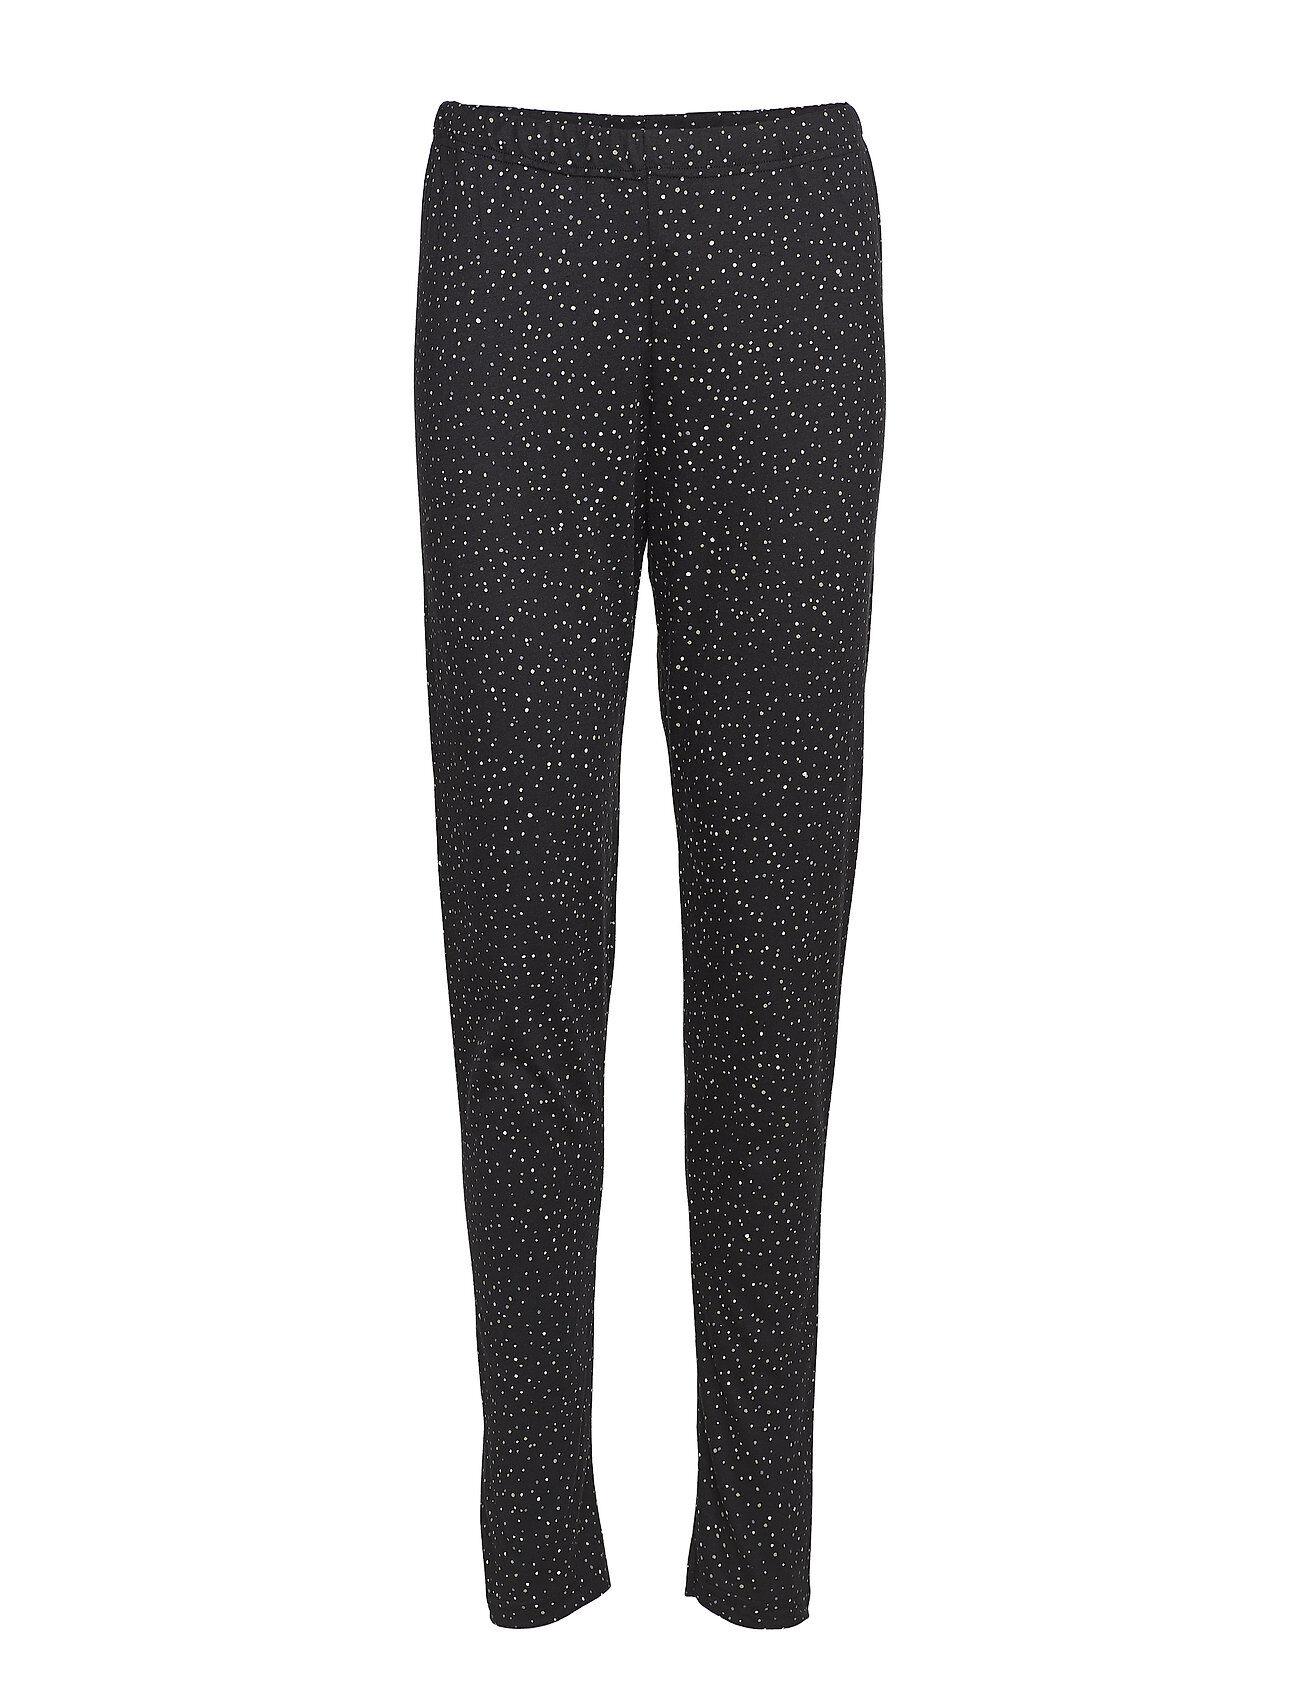 Nanso Ladies Trousers, Hiutale